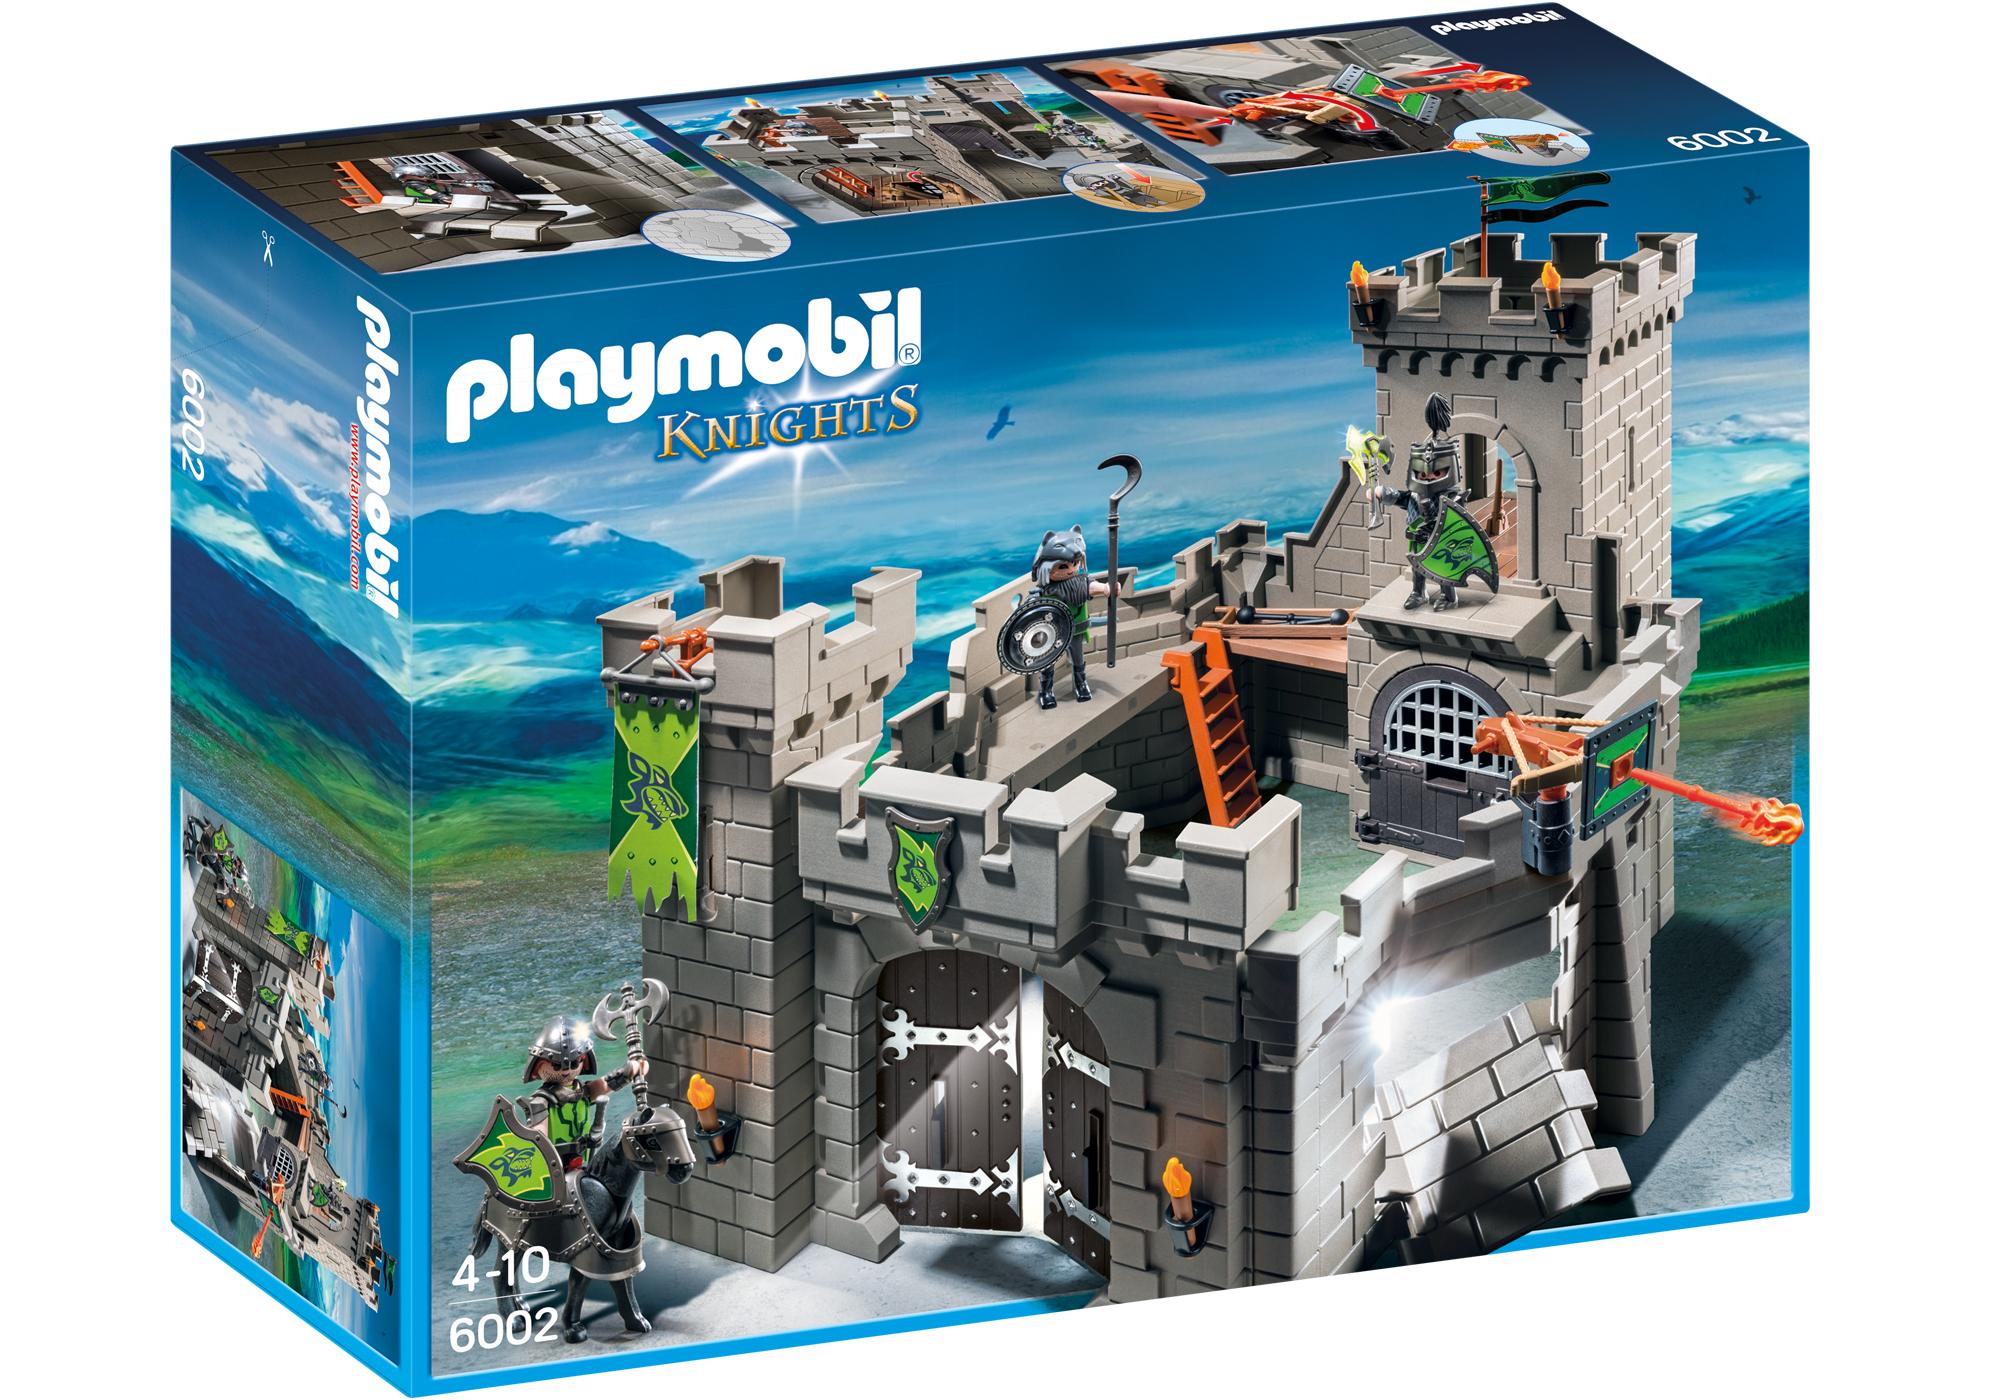 http://media.playmobil.com/i/playmobil/6002_product_box_front